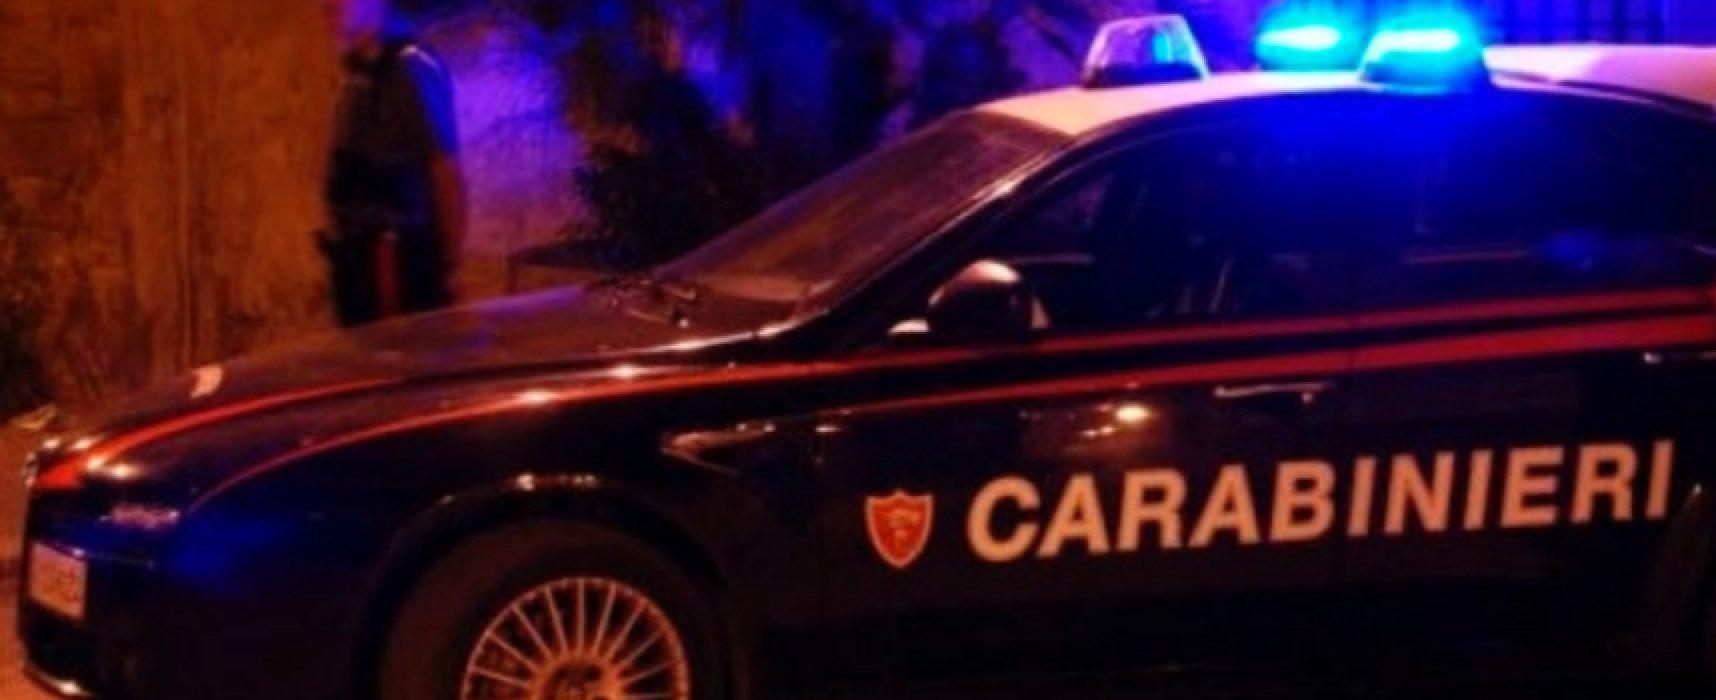 Maxi-blitz antidroga a Bisceglie, 12 arresti